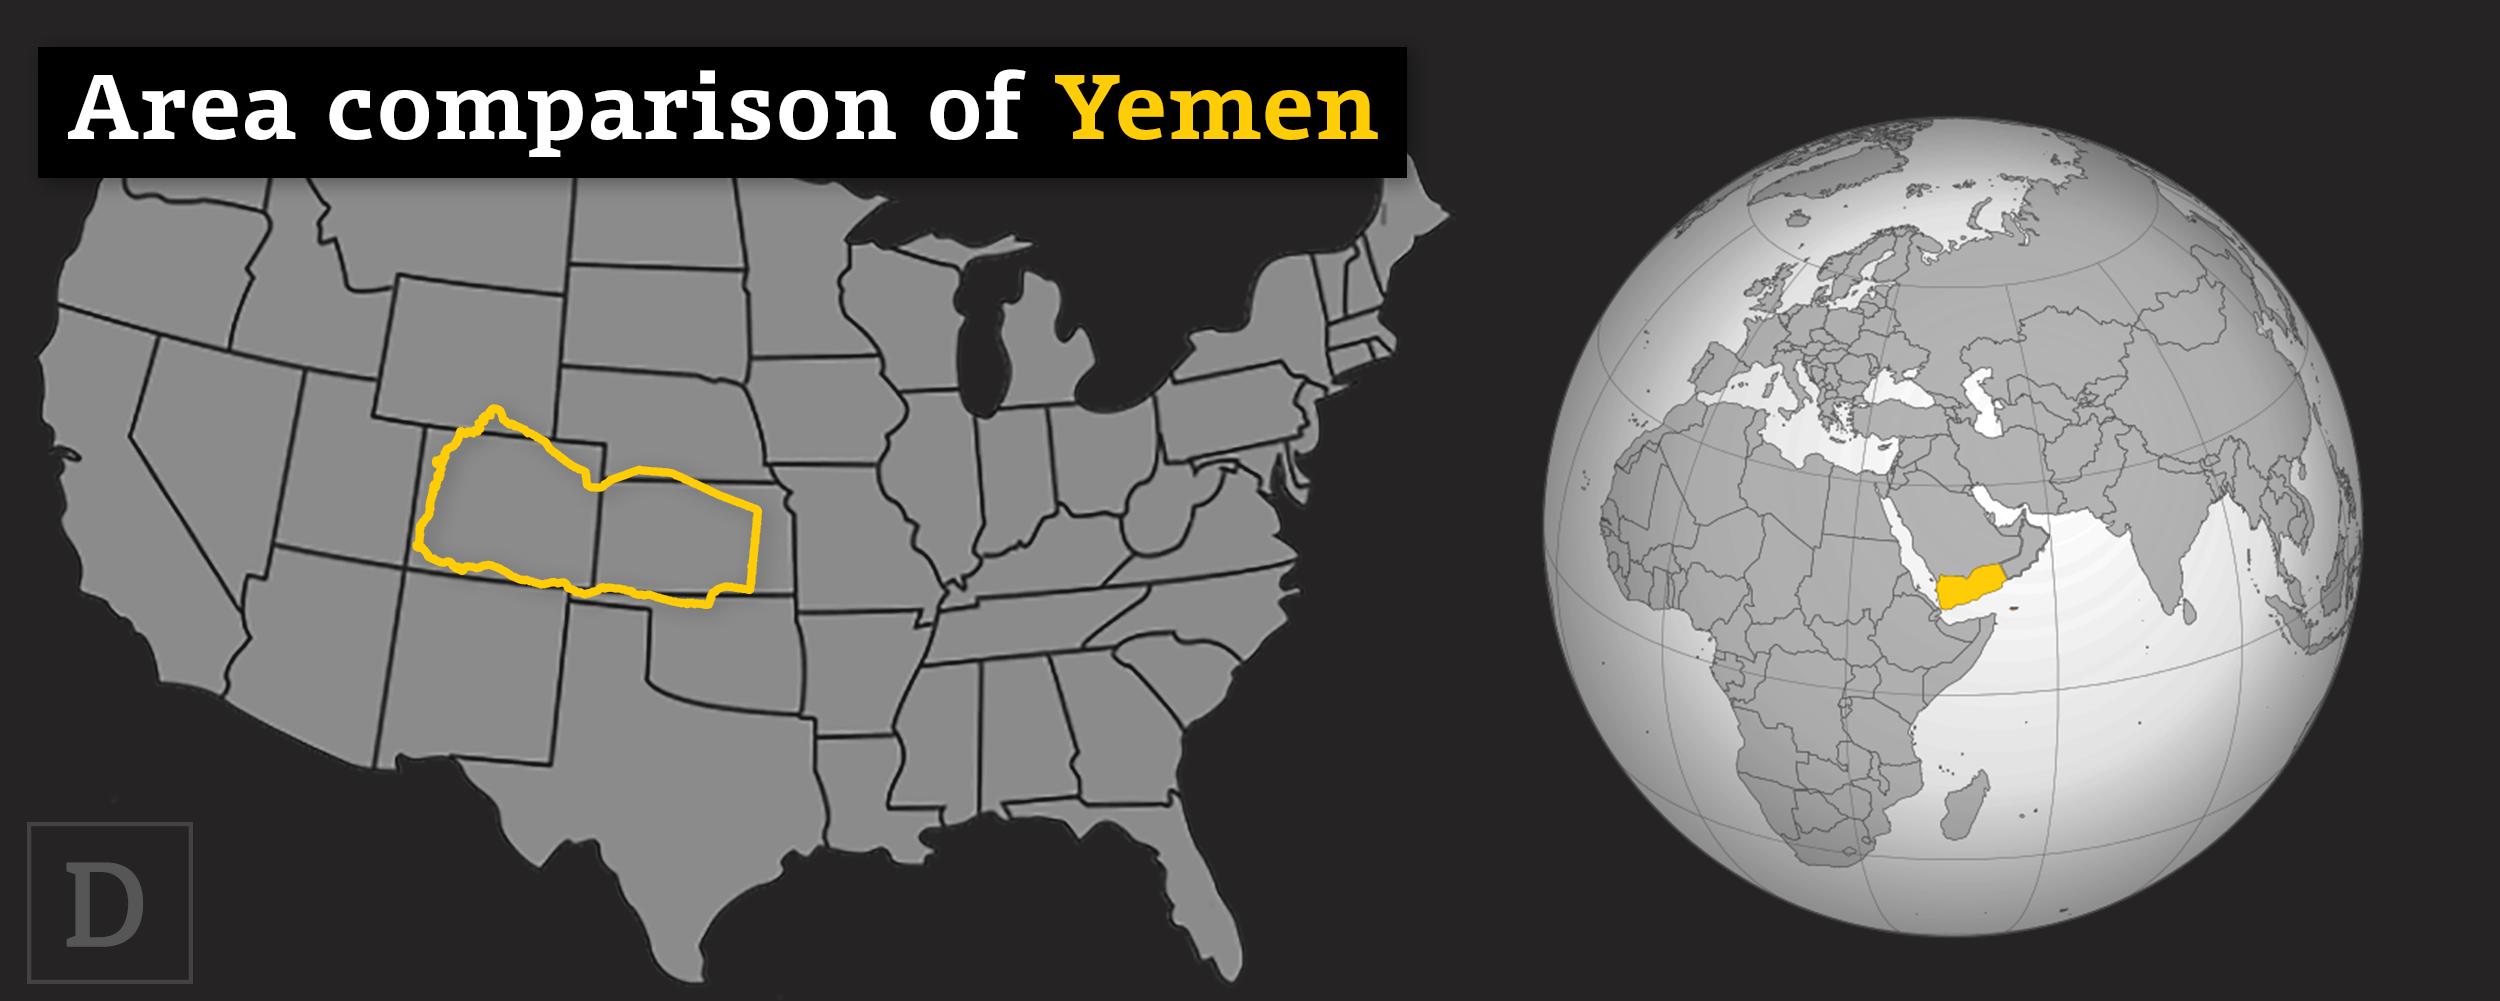 https://cdn.defenseone.com/media/featured/yemen_in_the_us-4.png